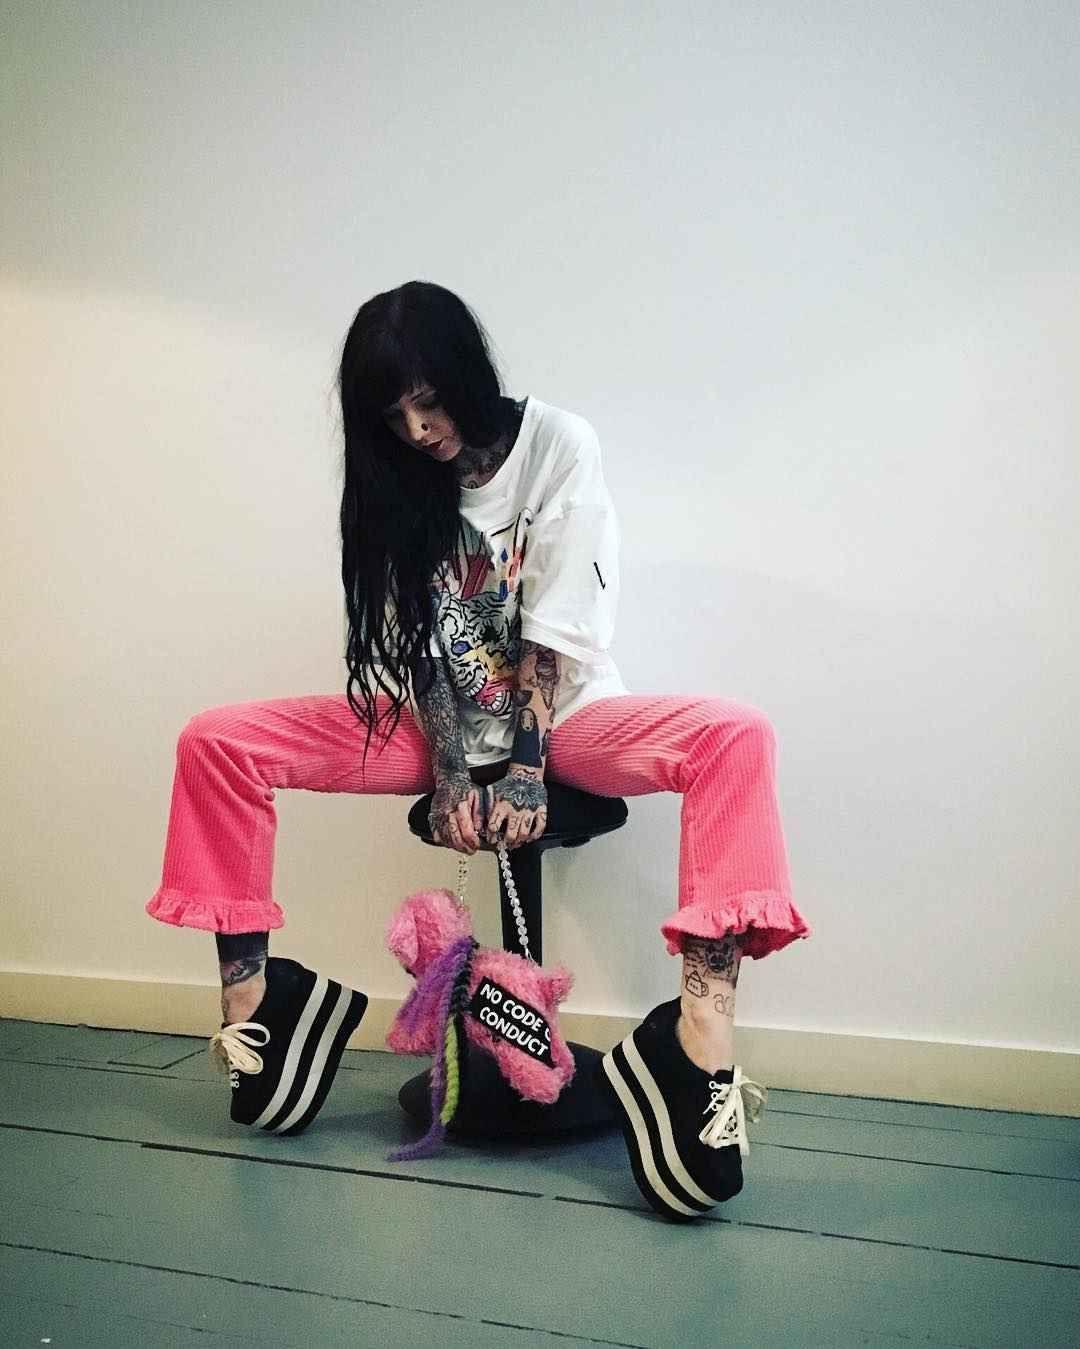 Tattoo artist, model and TV star Grace Neutral | United Kingdom | #inkpplcom #inkpeople #inked #tattoo #models #tattooed #inkedmodel #inkedgirls #tattooedmodel #alternativemodel #famoustattooedgirl #fashionmodel #inkmodels #NeedlesandPins #inkmodel #inkgirls #tattooedgirls